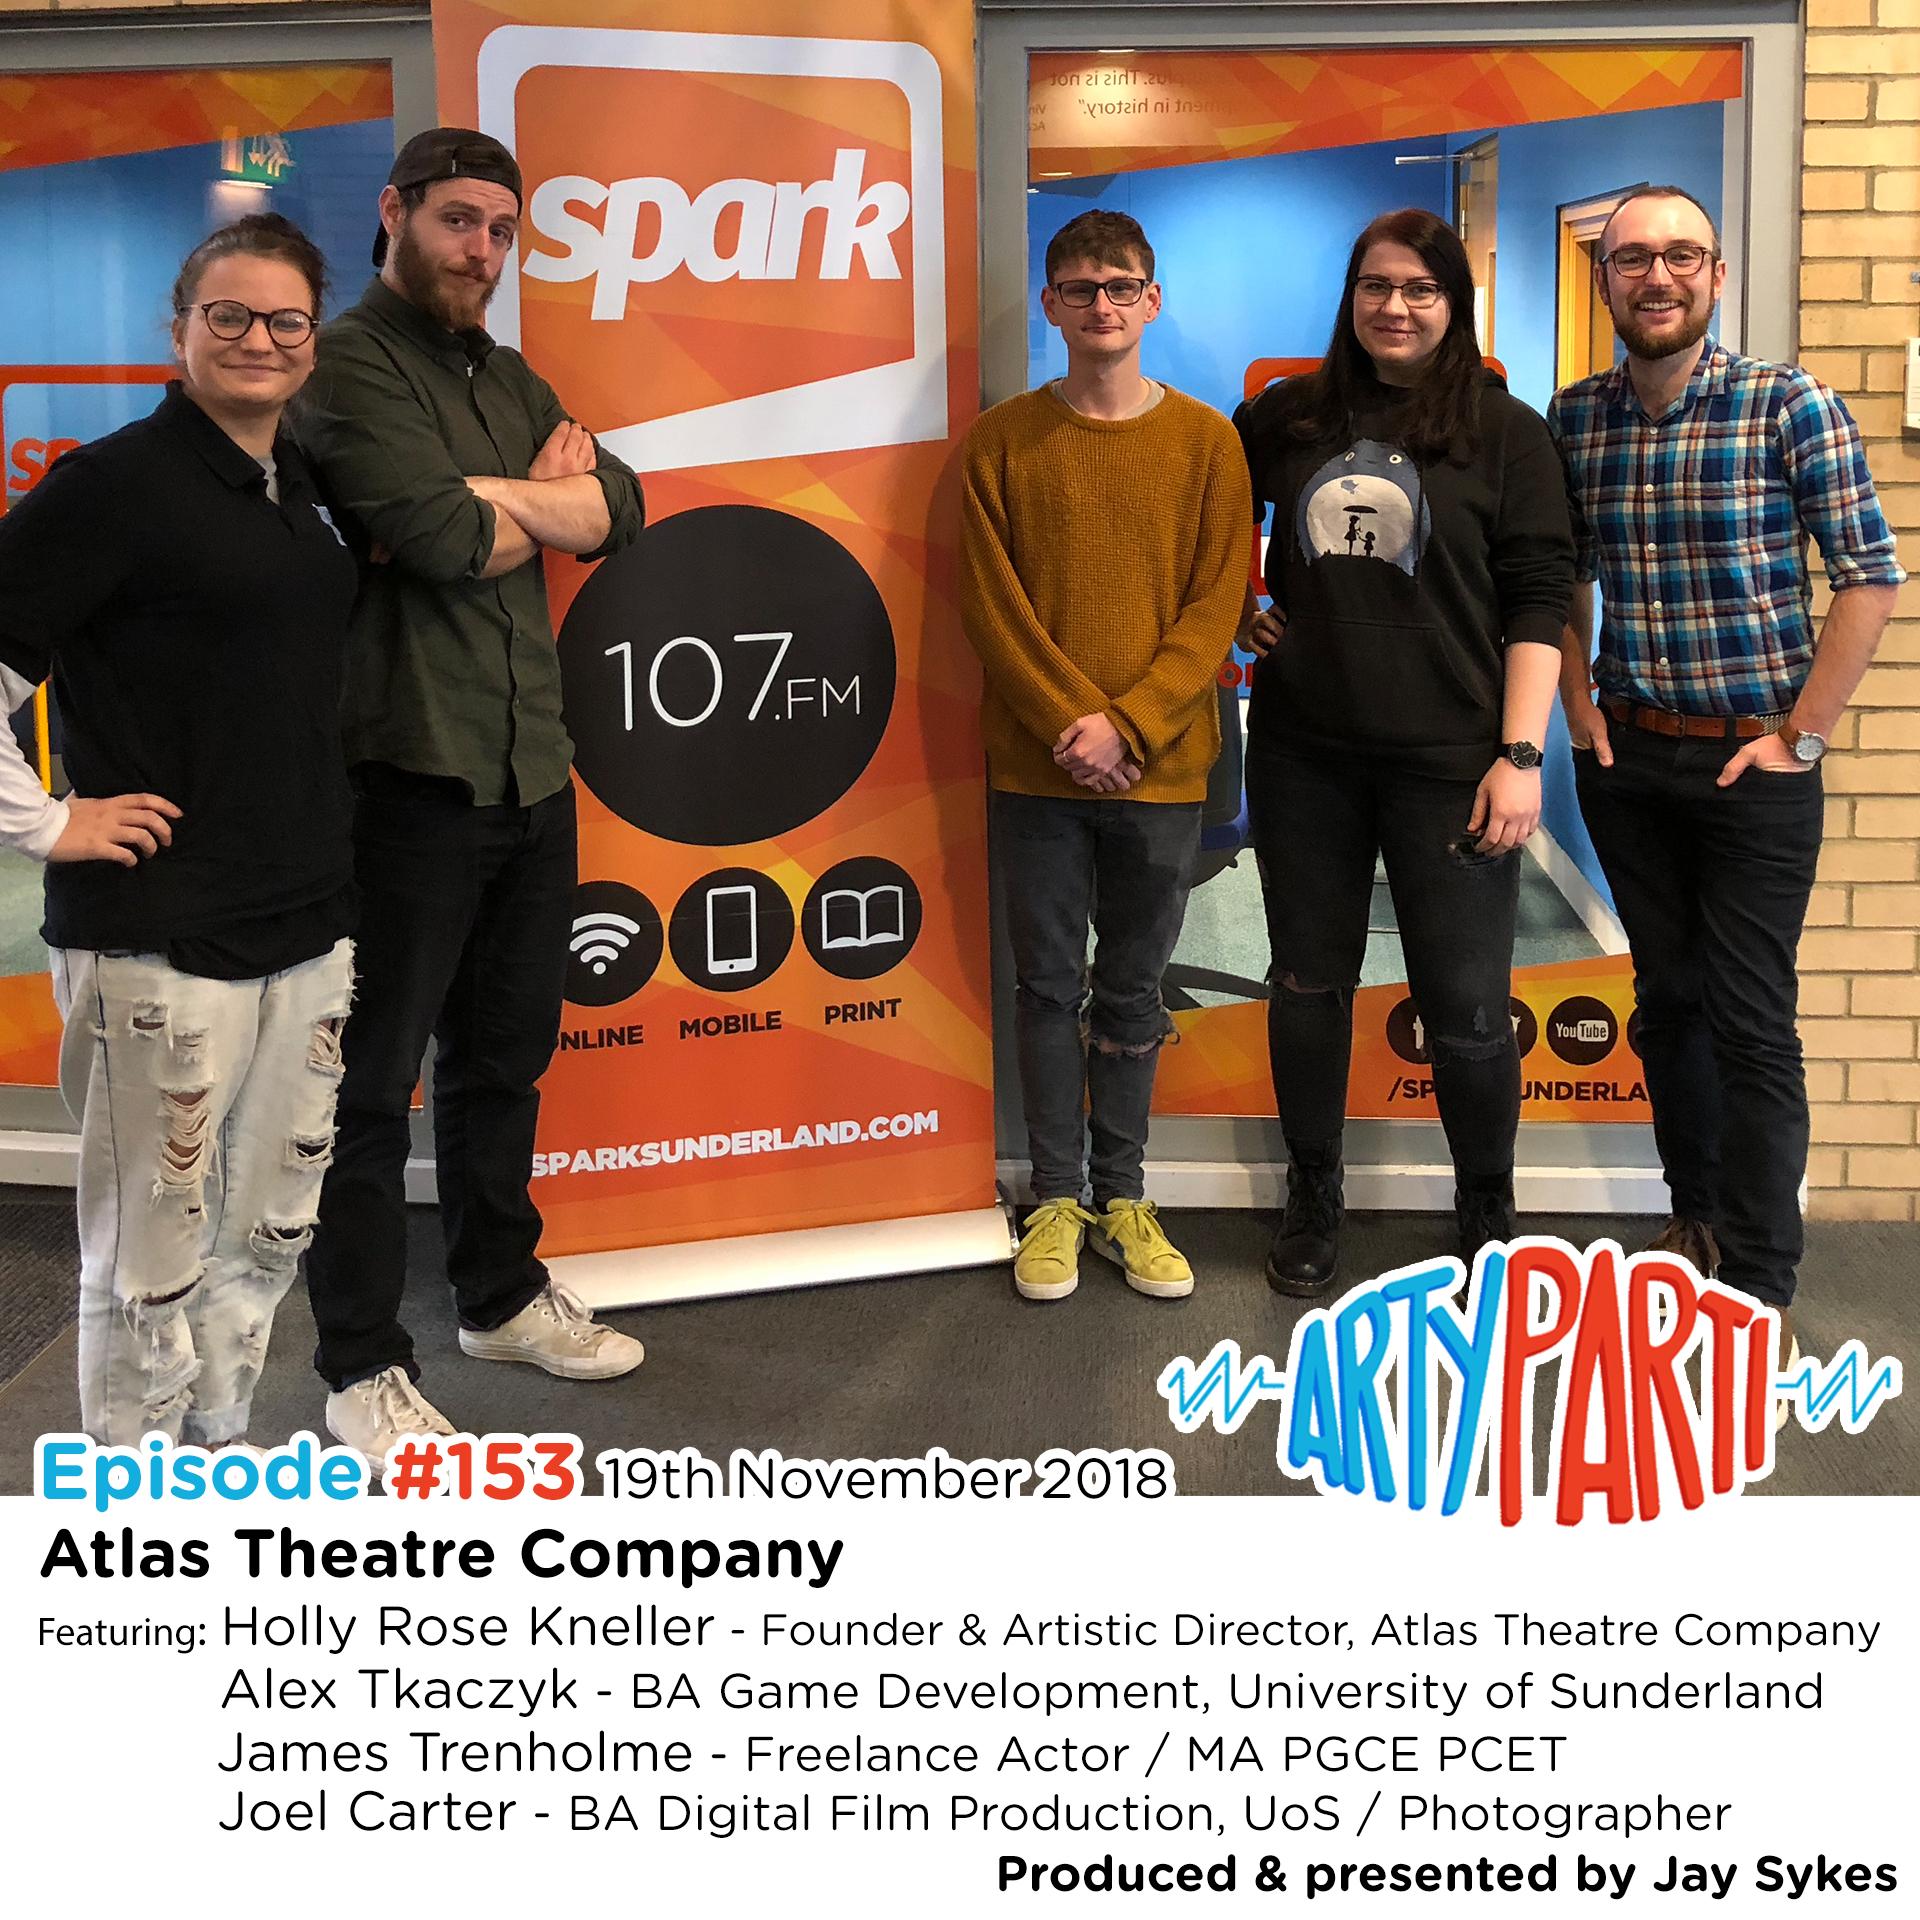 ArtyParti 153 - Atlas Theatre Company.jpg